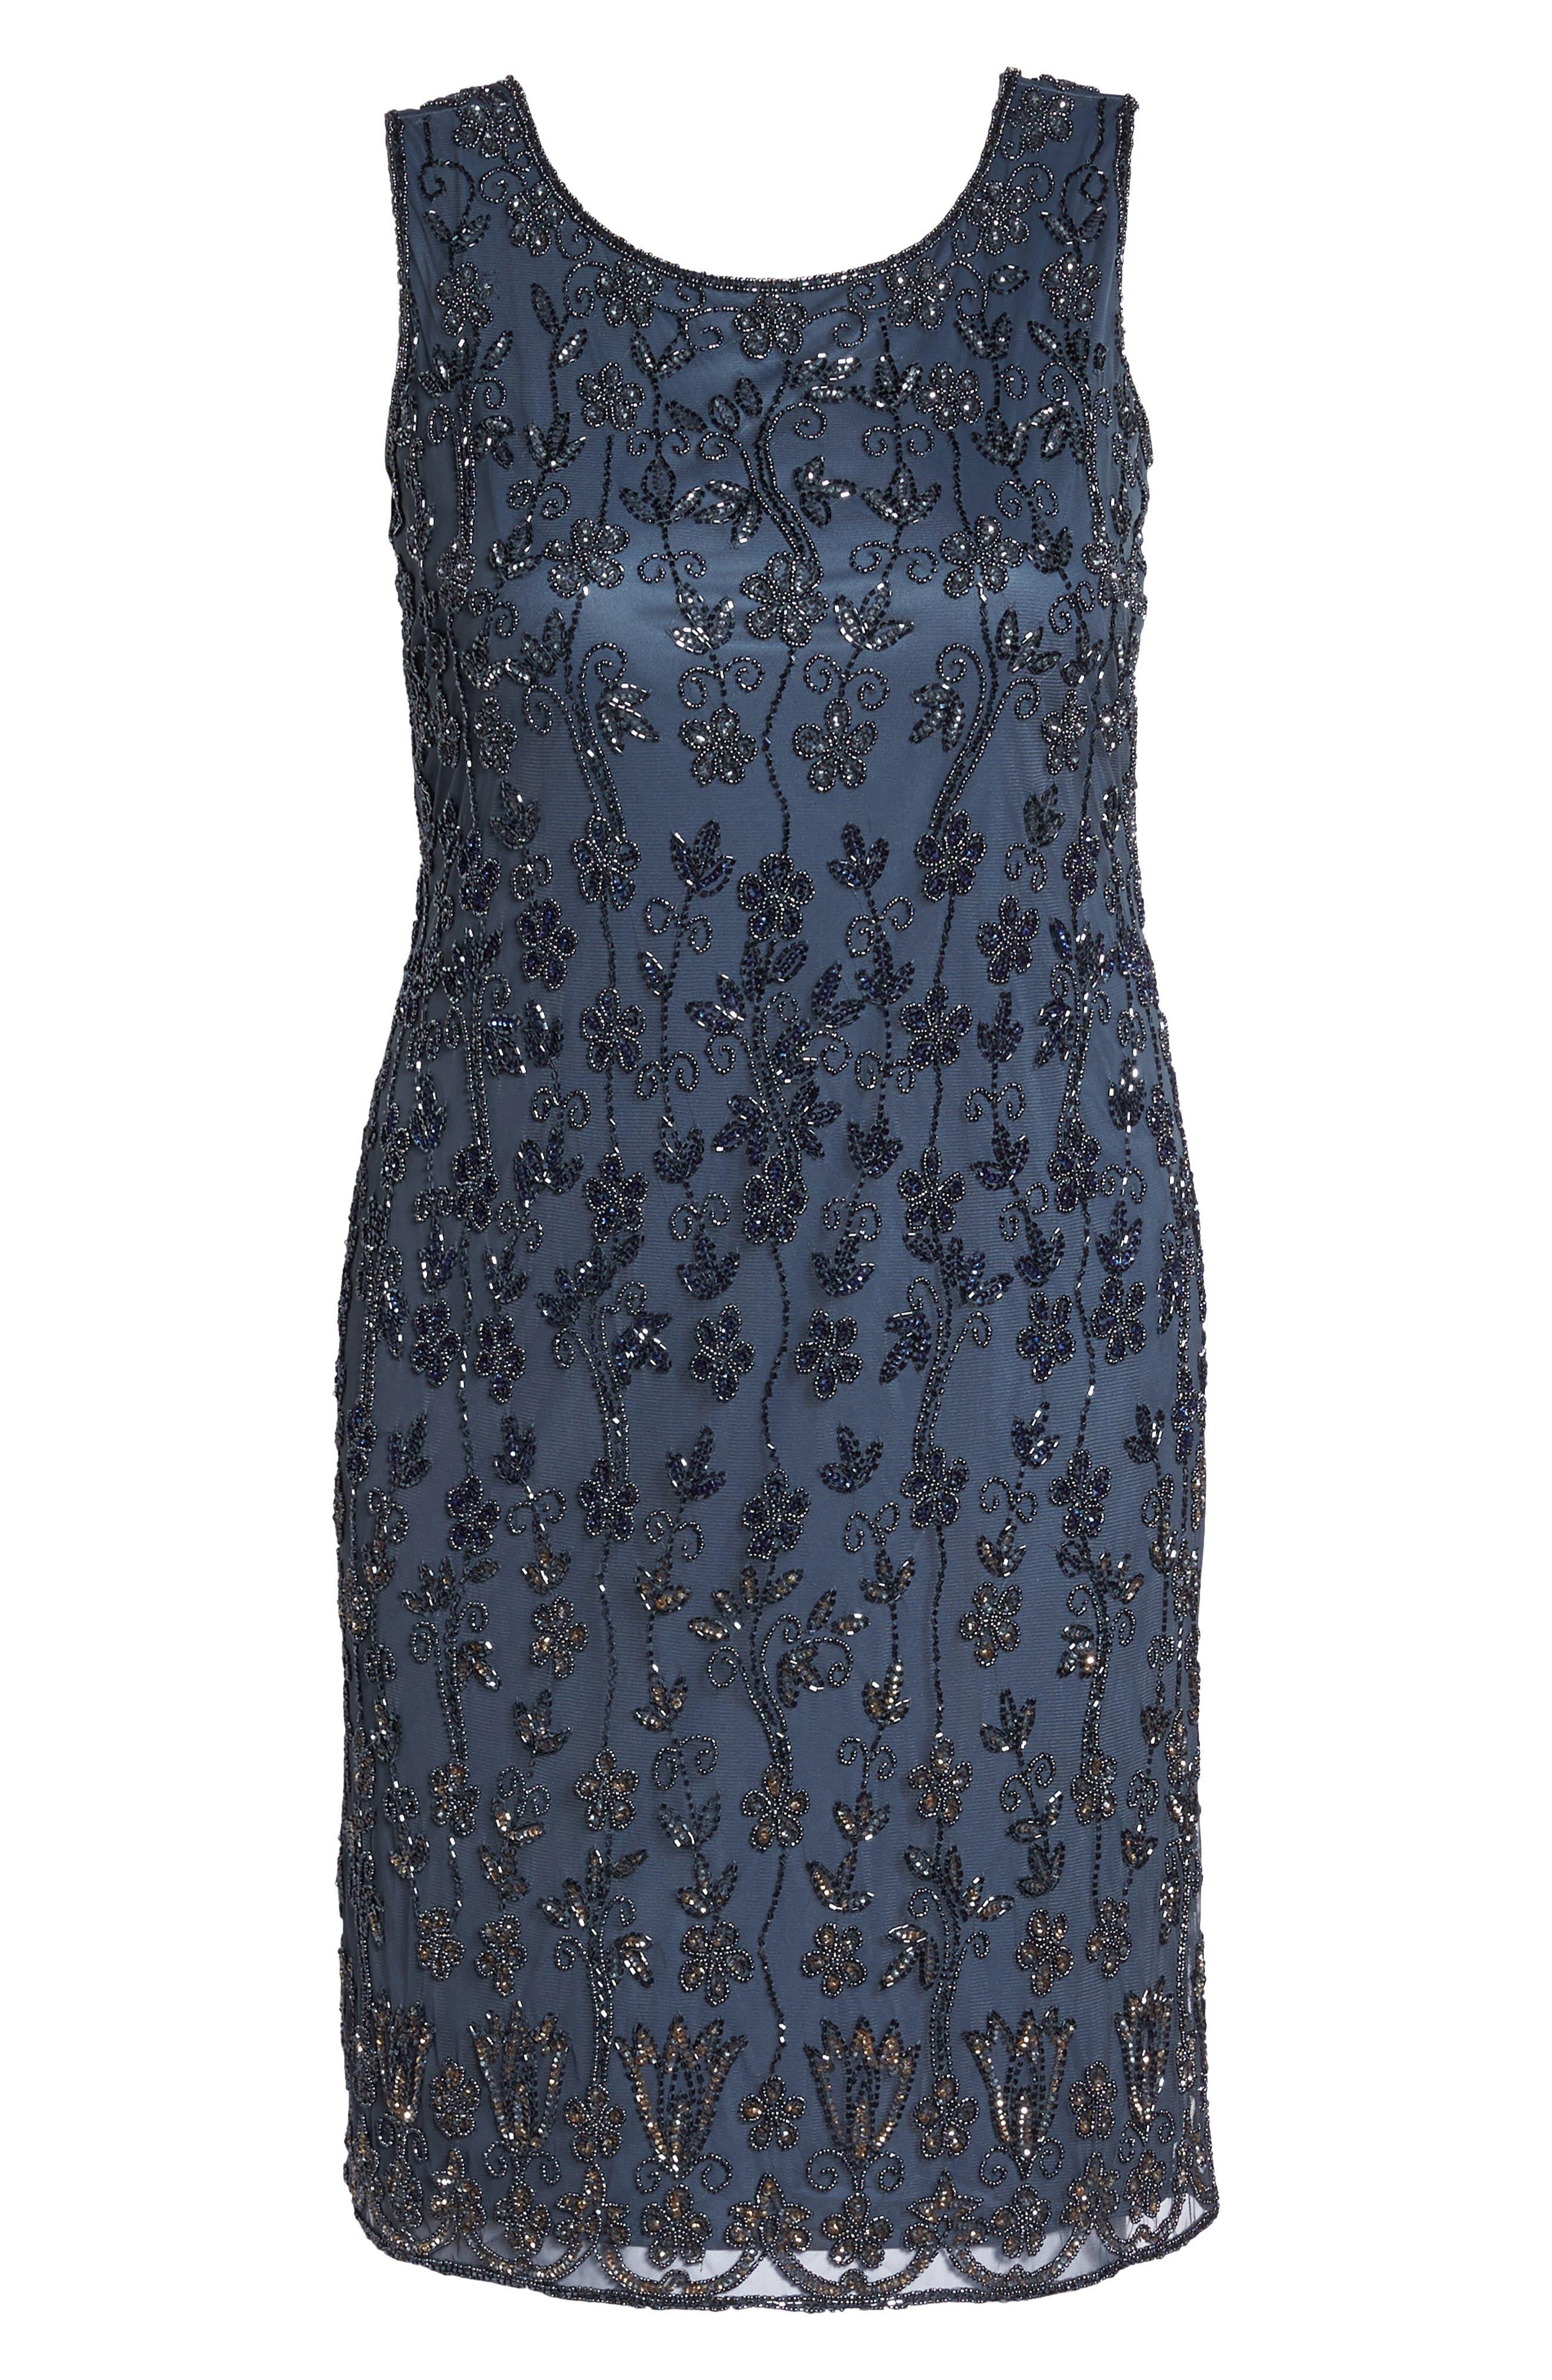 Embellished Mesh Sheath Dress,                             Alternate thumbnail 6, color,                             New Grey